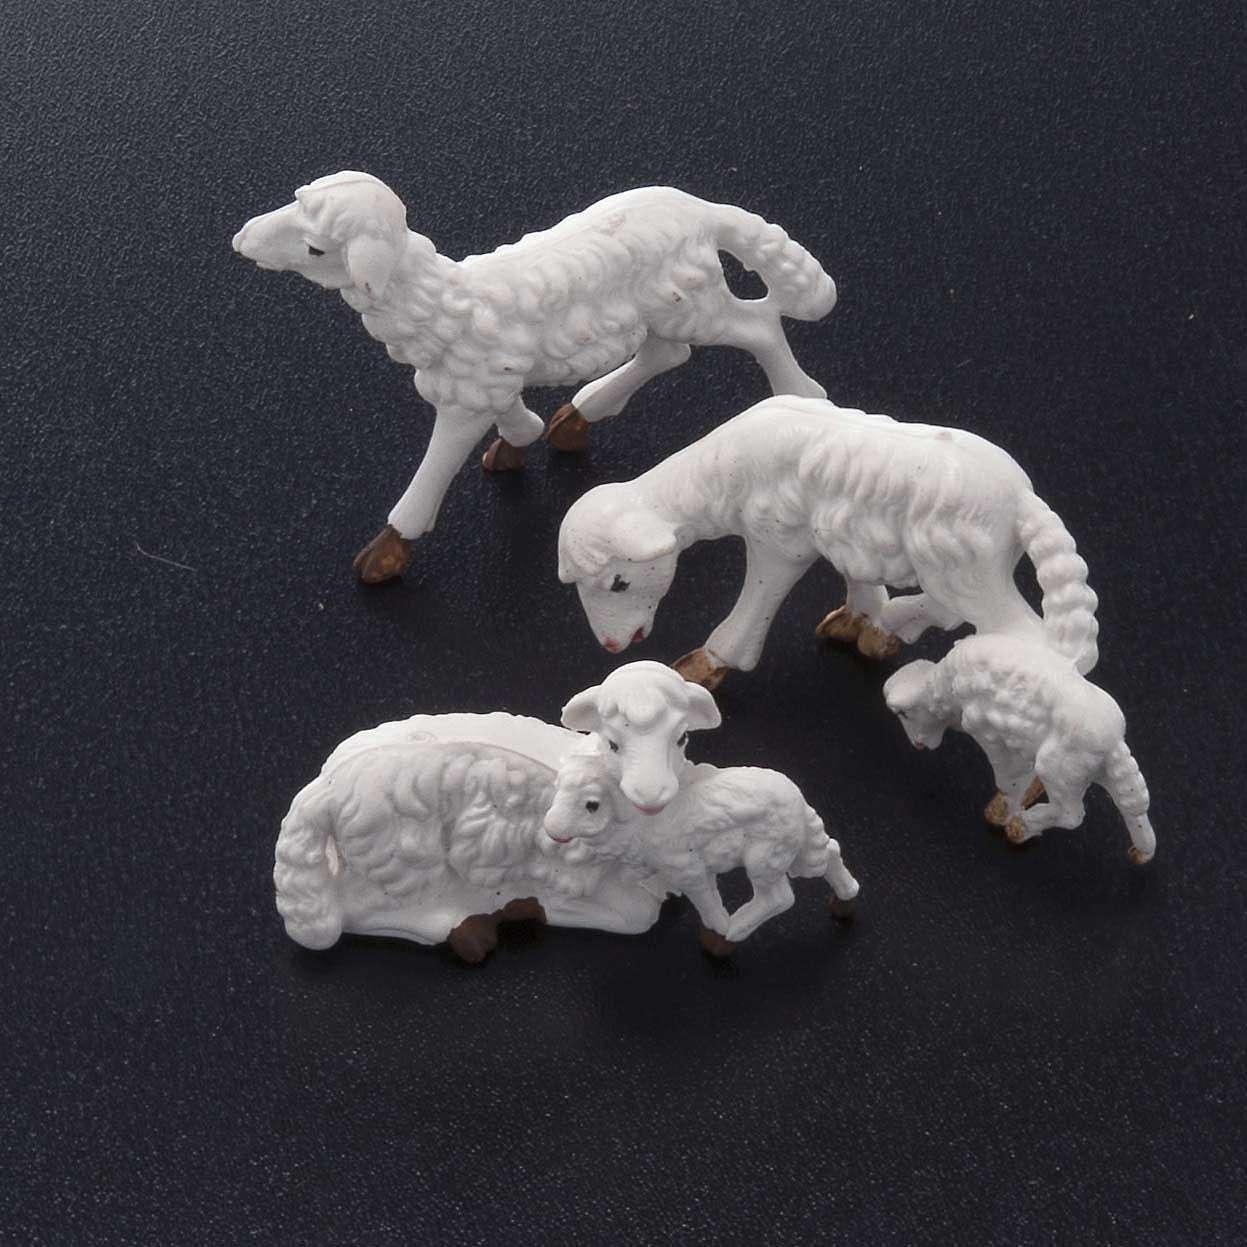 Pecore presepe plastica bianca 10 pz. 10 cm 3